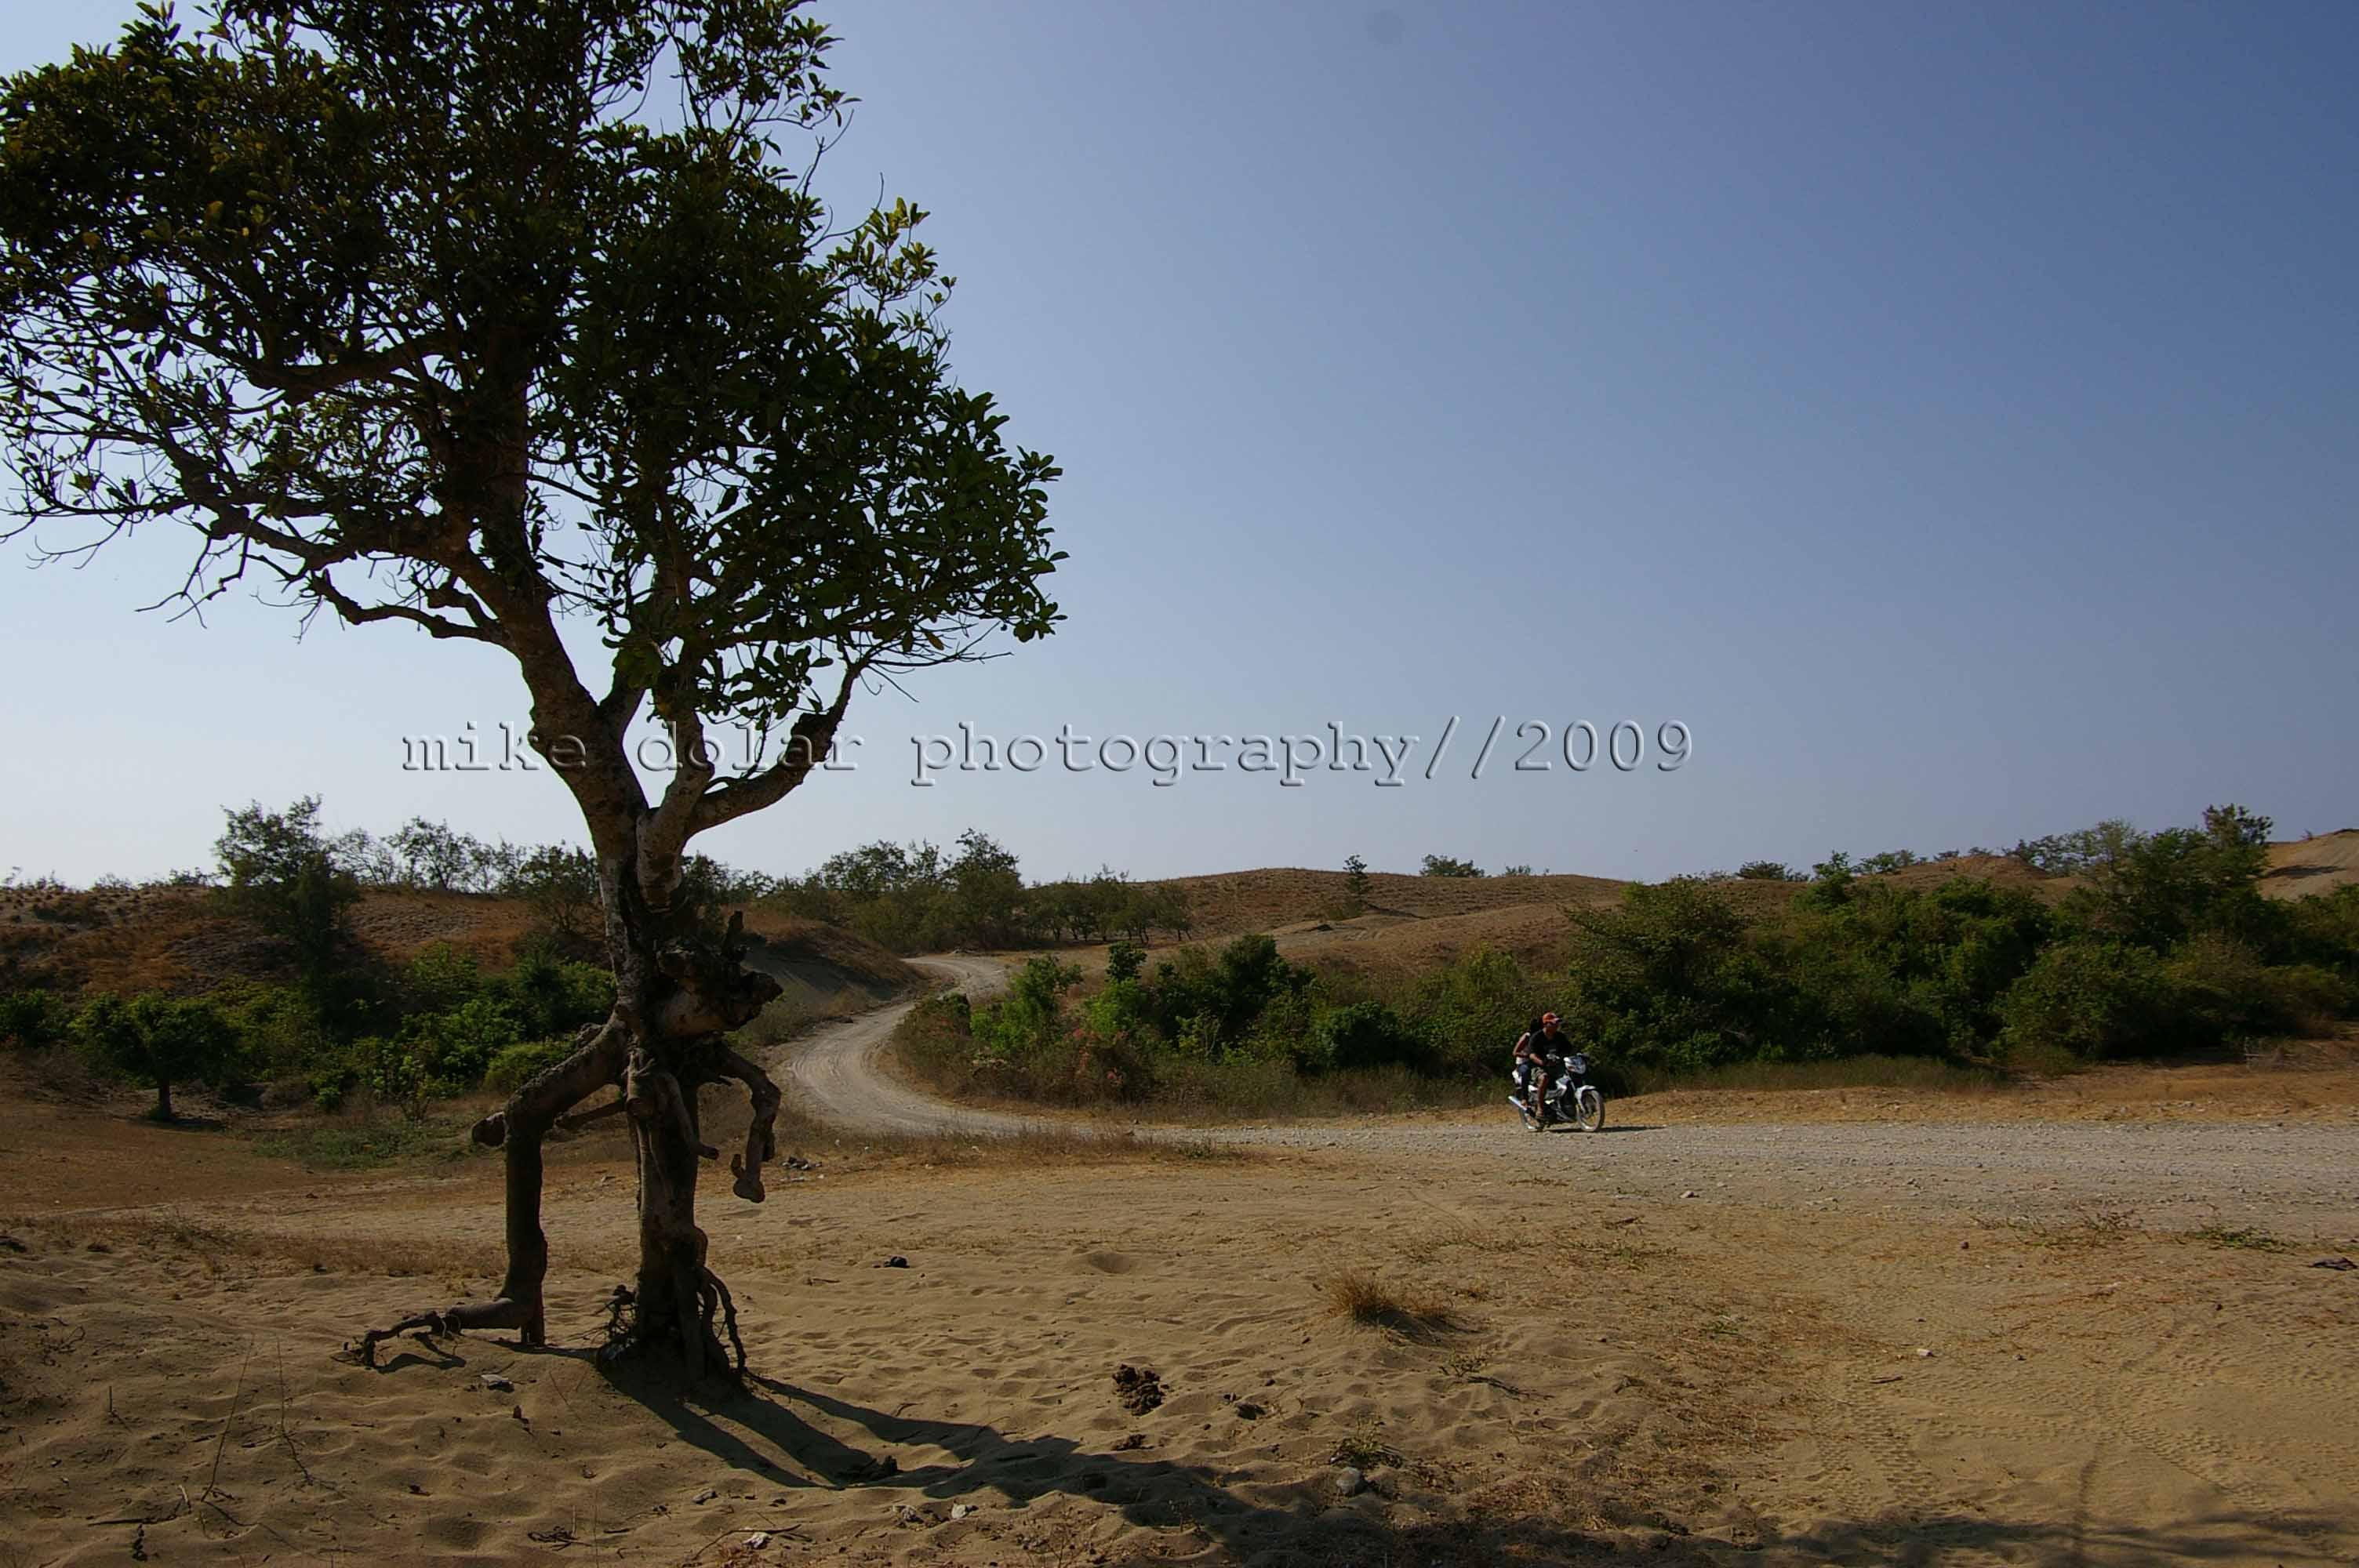 lonely road at la paz sand dune